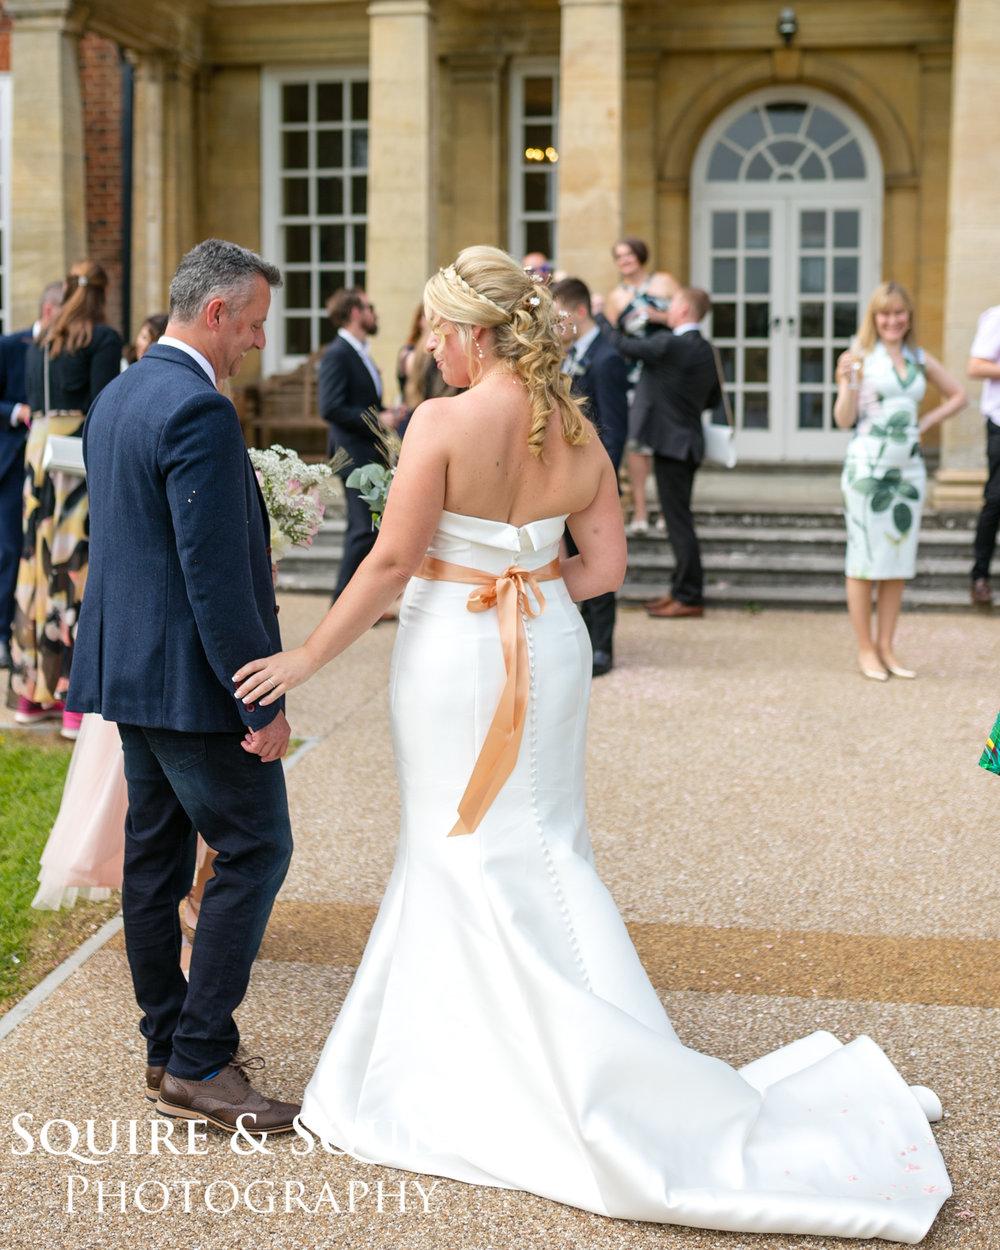 wedding_photography_catthorpe Manor (52 of 66).jpg